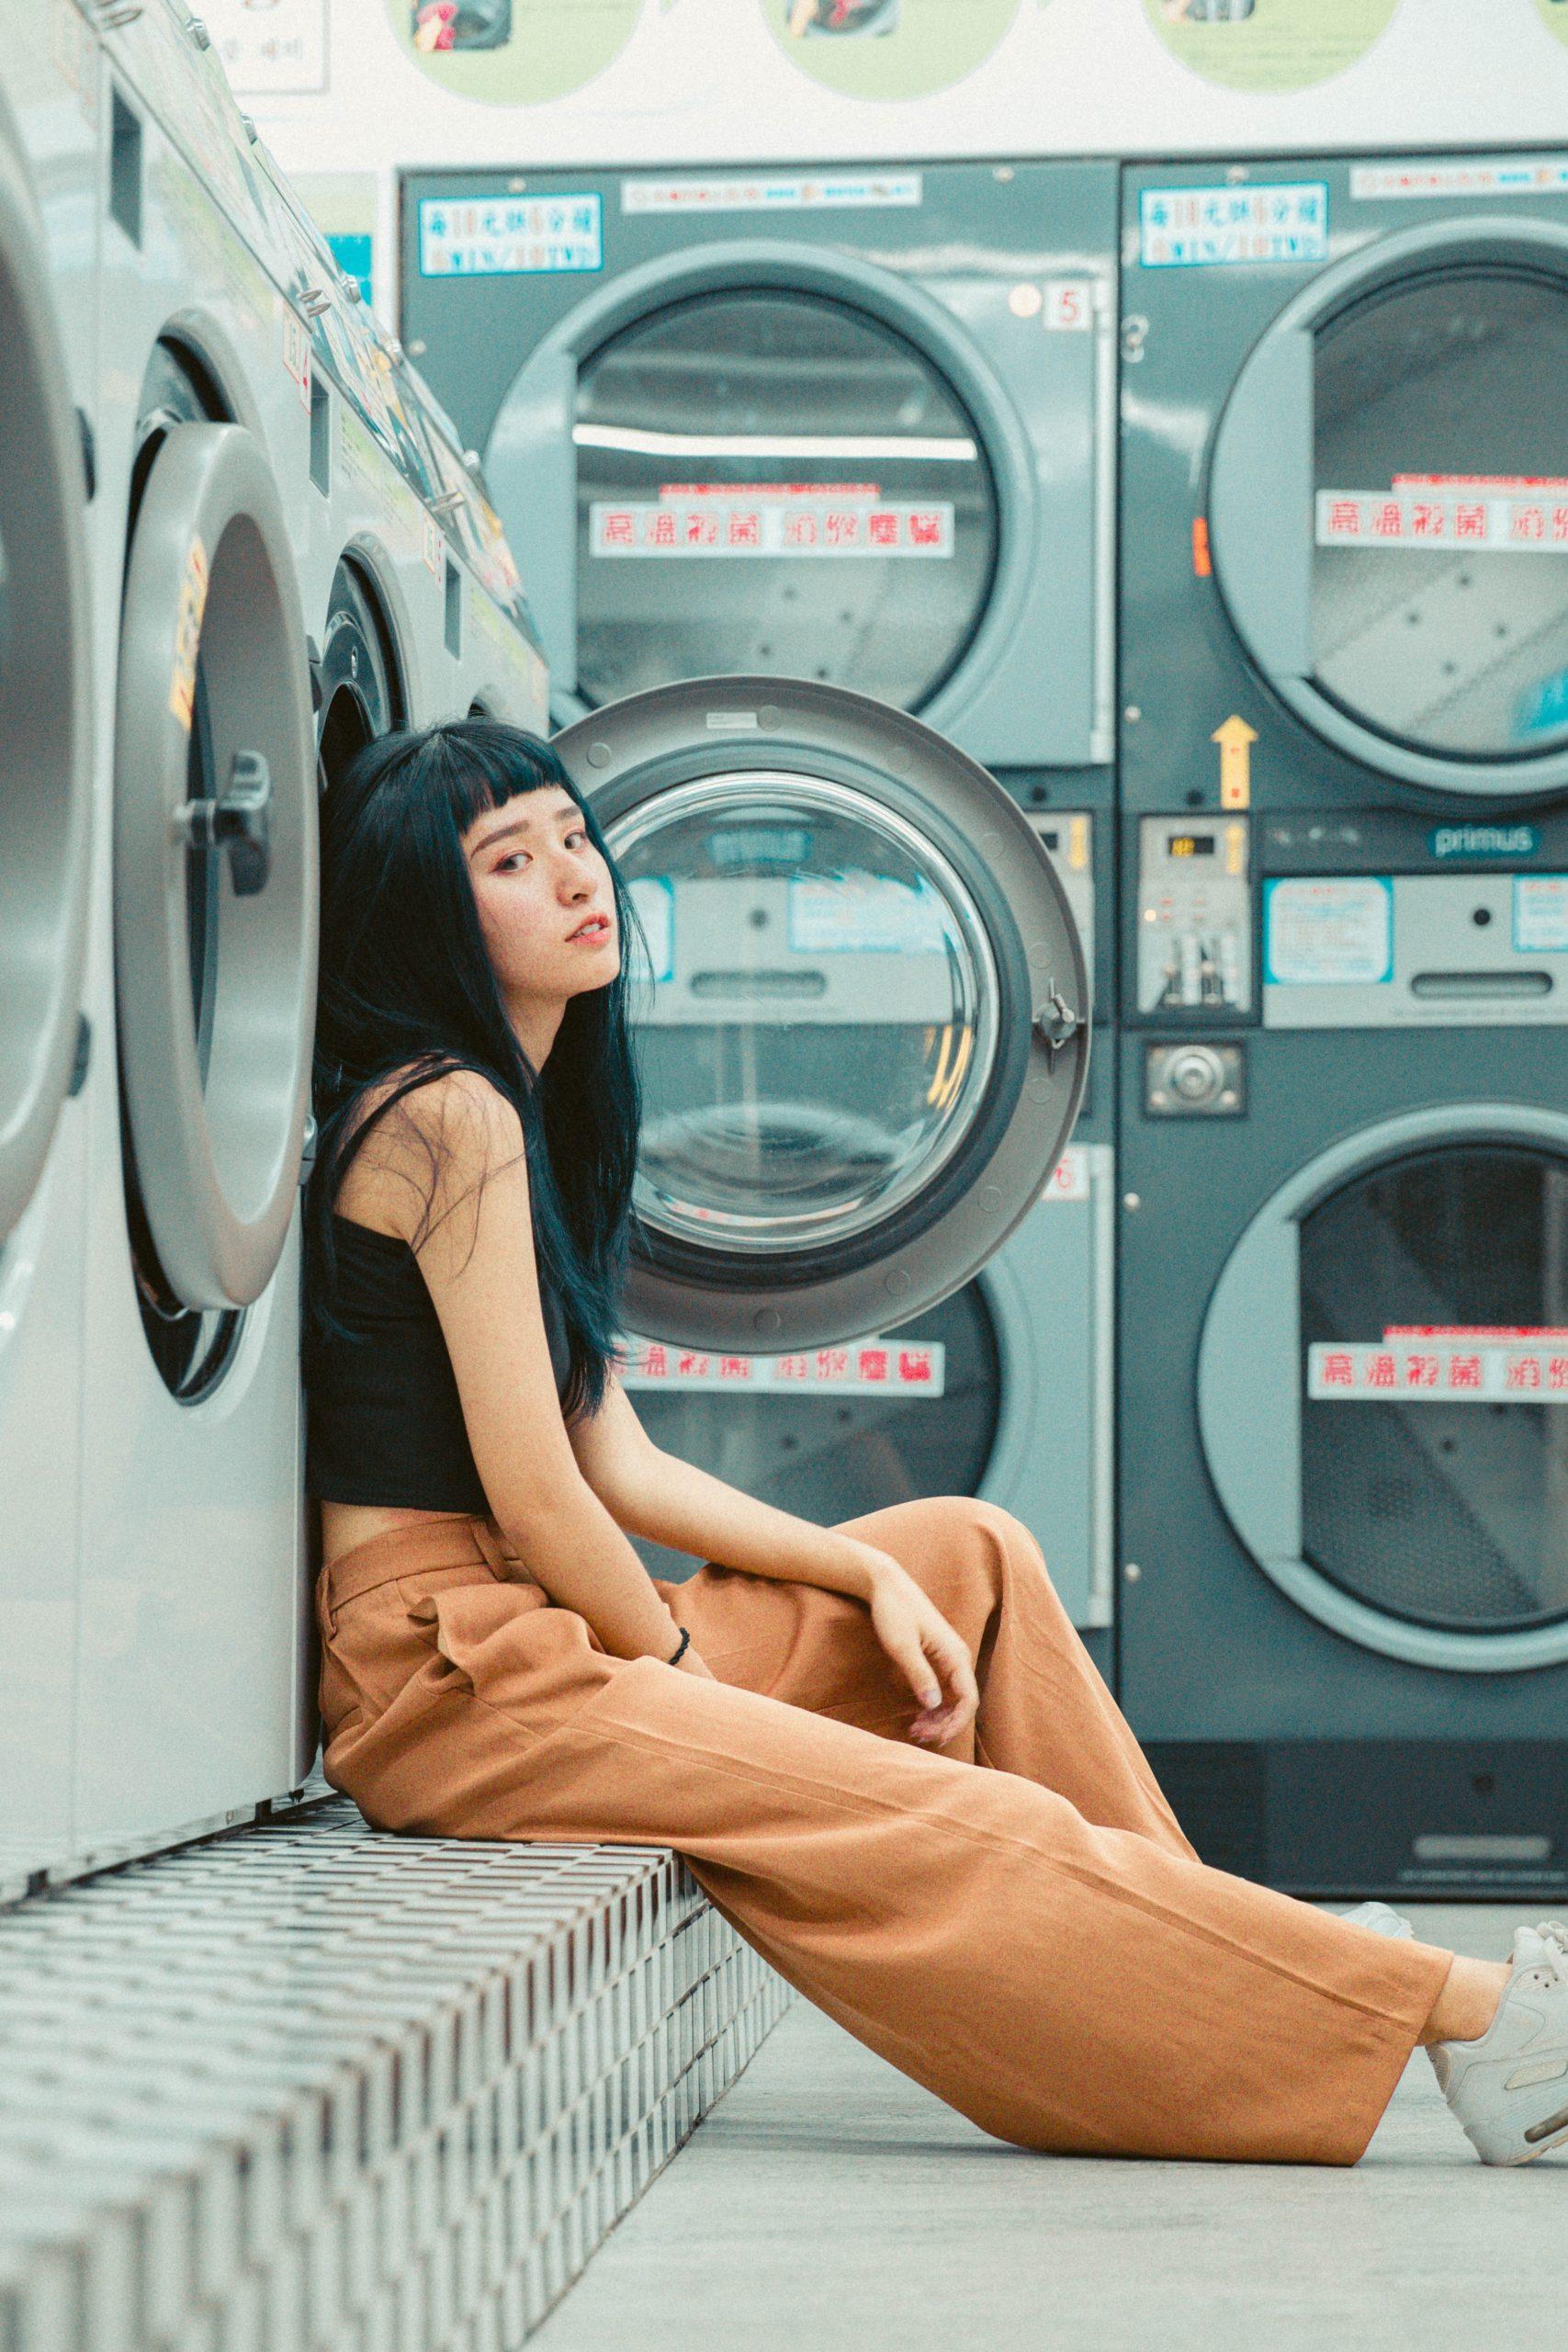 Best Washing Machines in the UK 2020